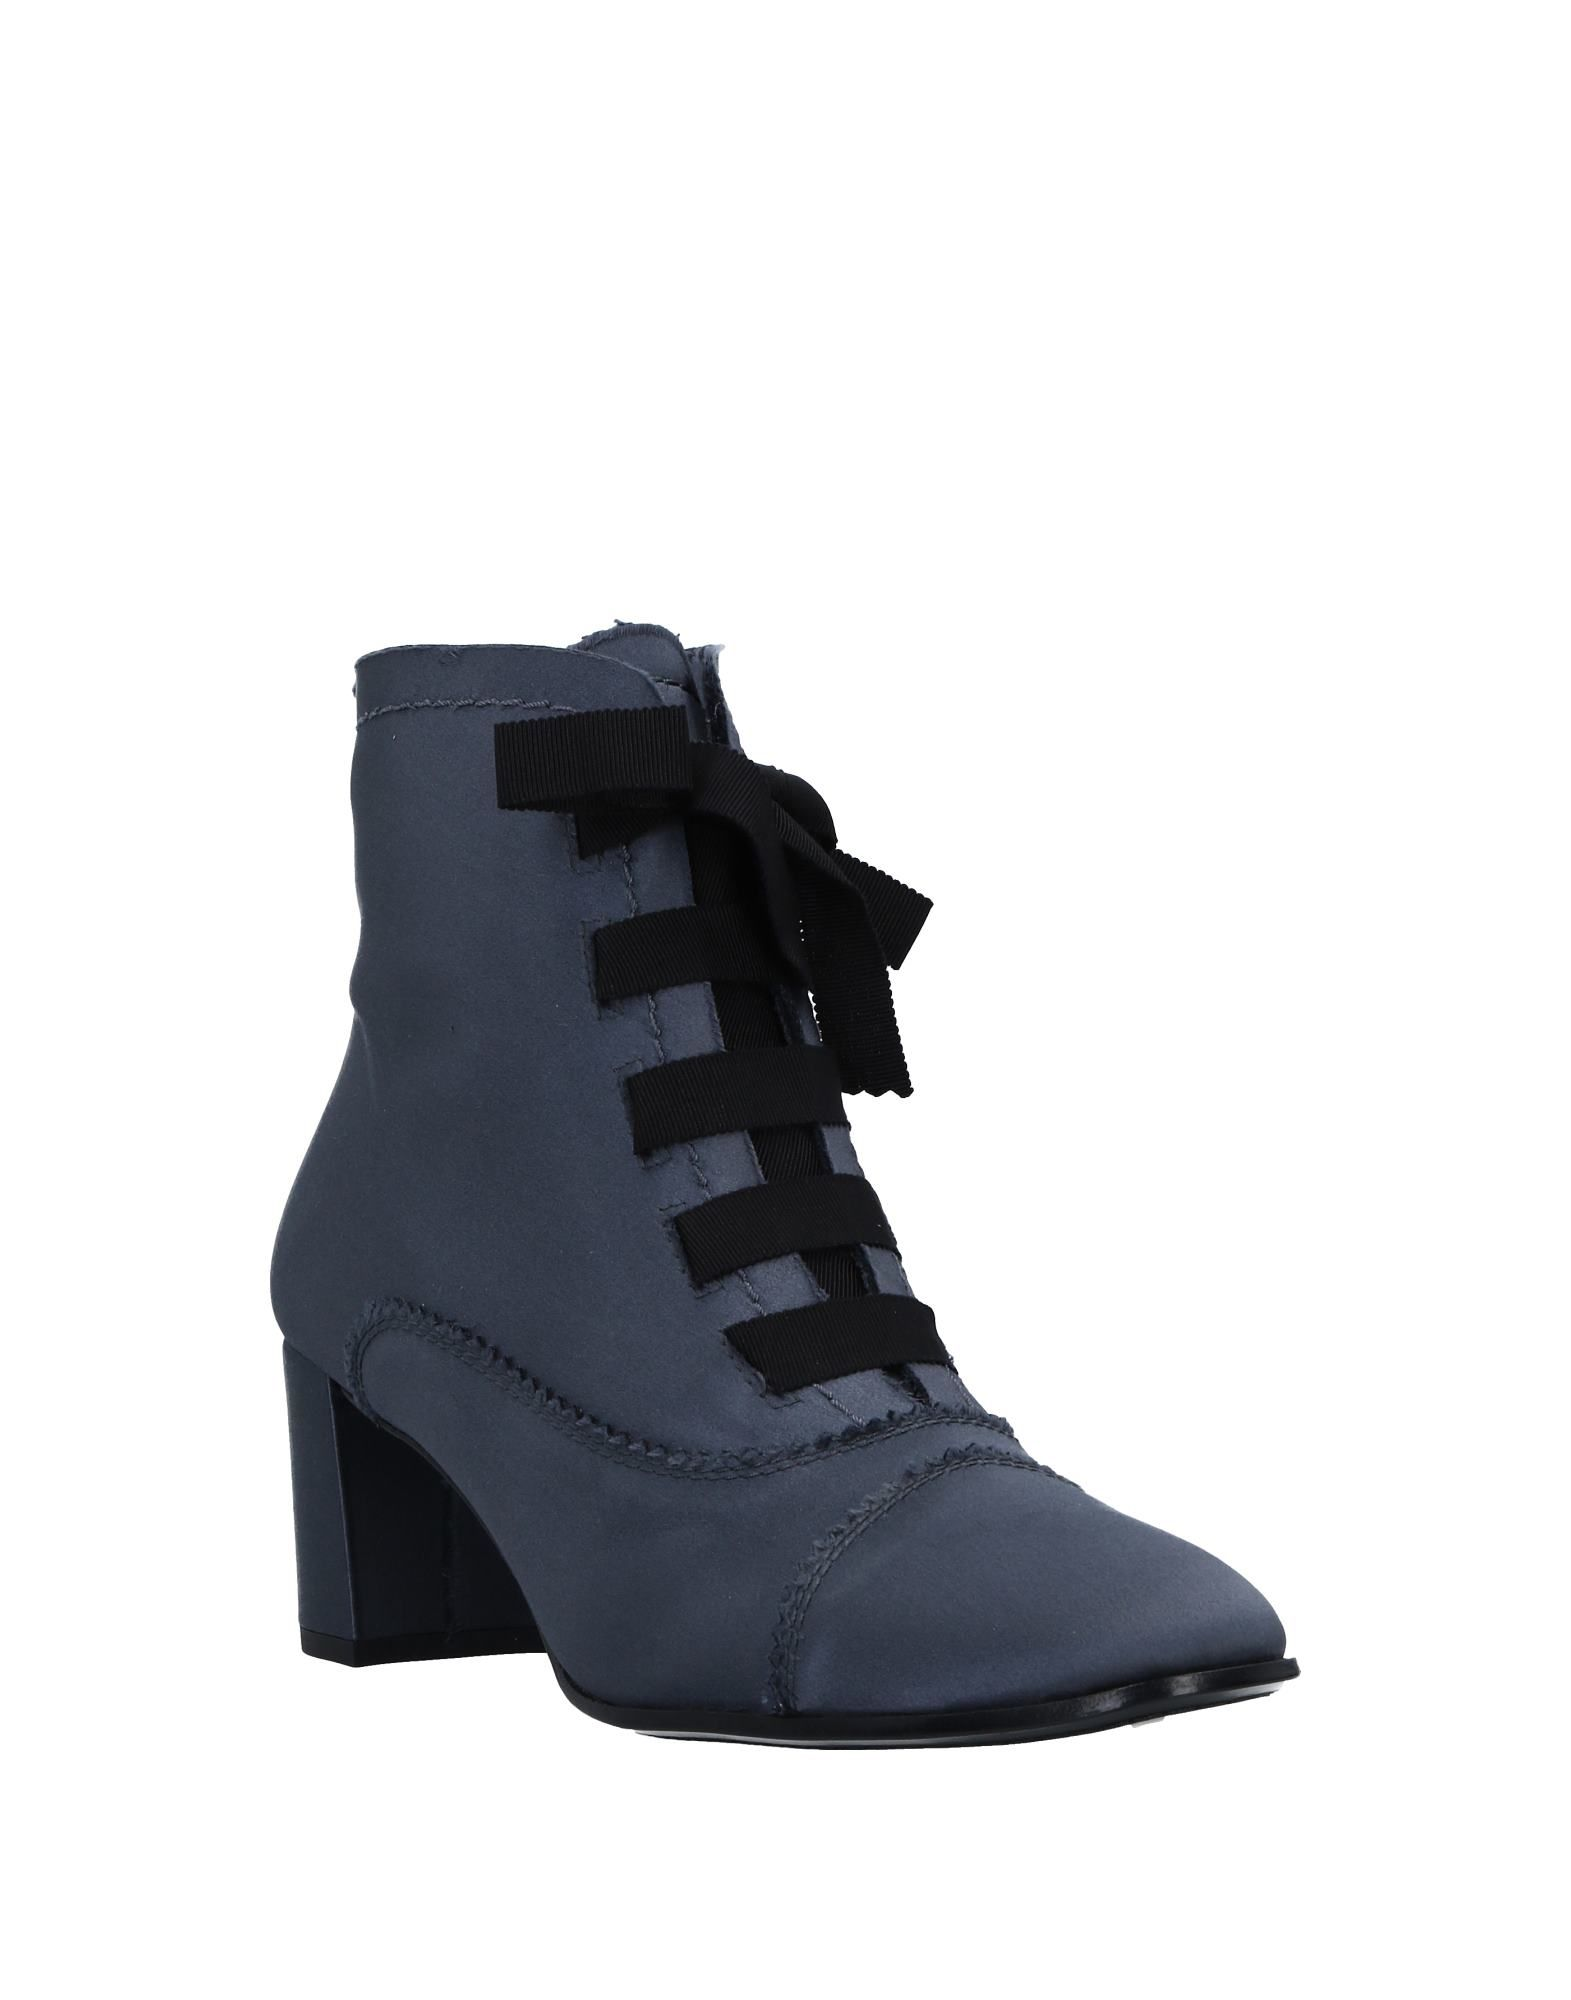 Pedro García Ankle Boot Boot Boot - Women Pedro García Ankle Boots online on  United Kingdom - 11528383FJ 4172d9